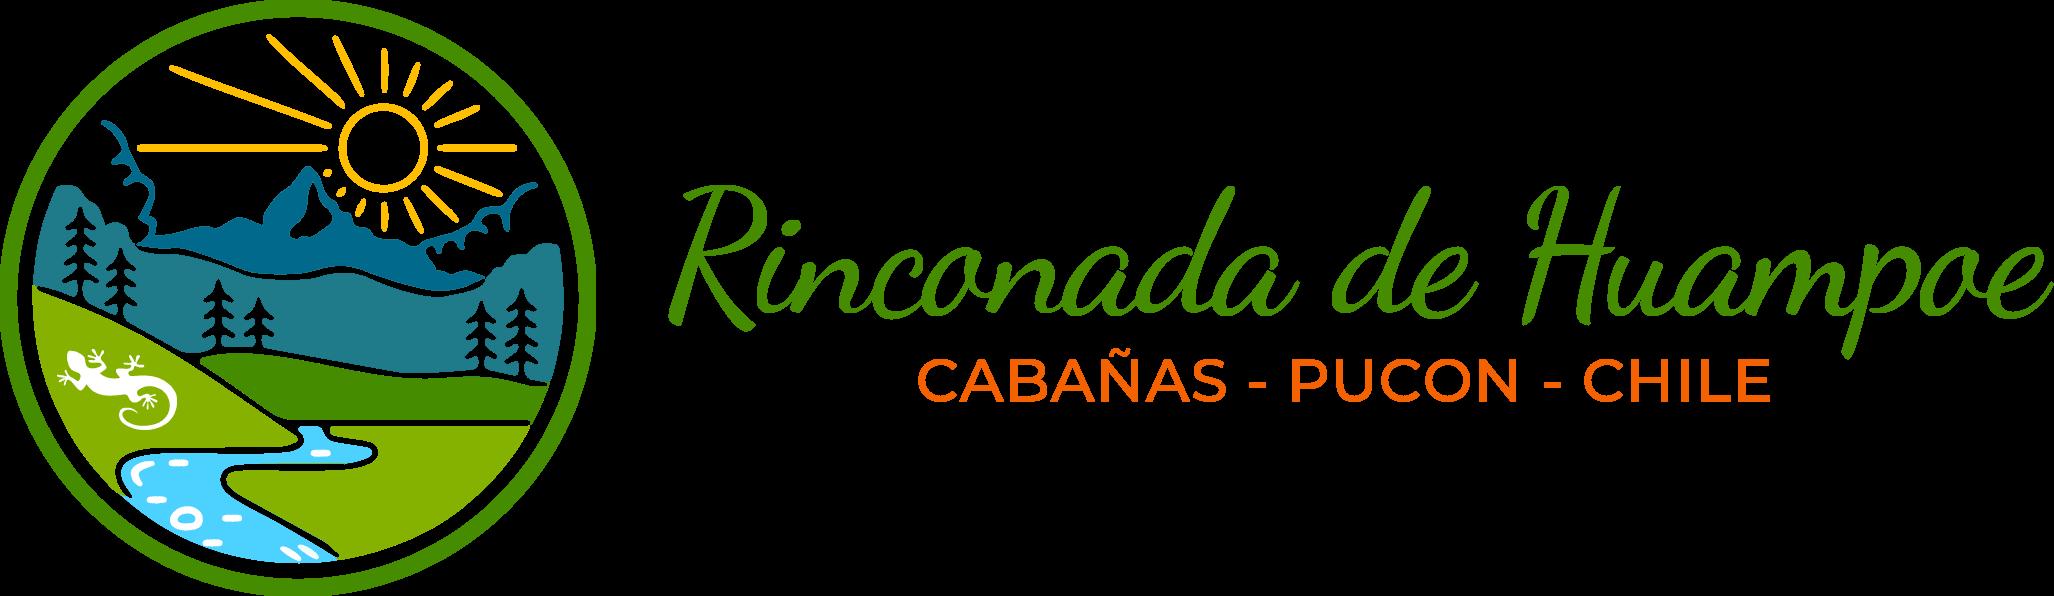 Cabañas Rinconada de Huampoe Pucon